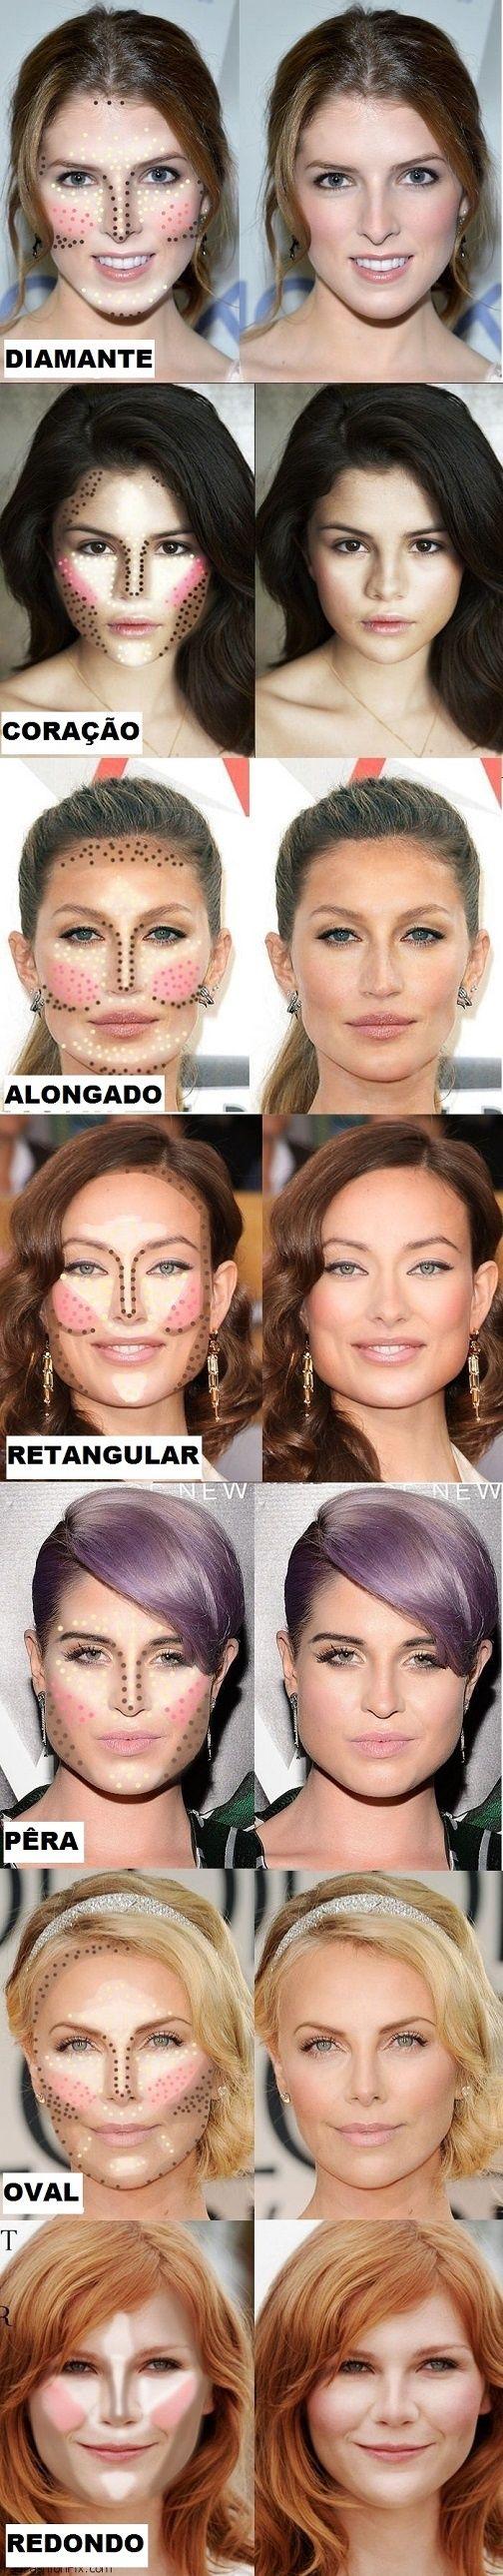 Contorno para cada formato de rosto